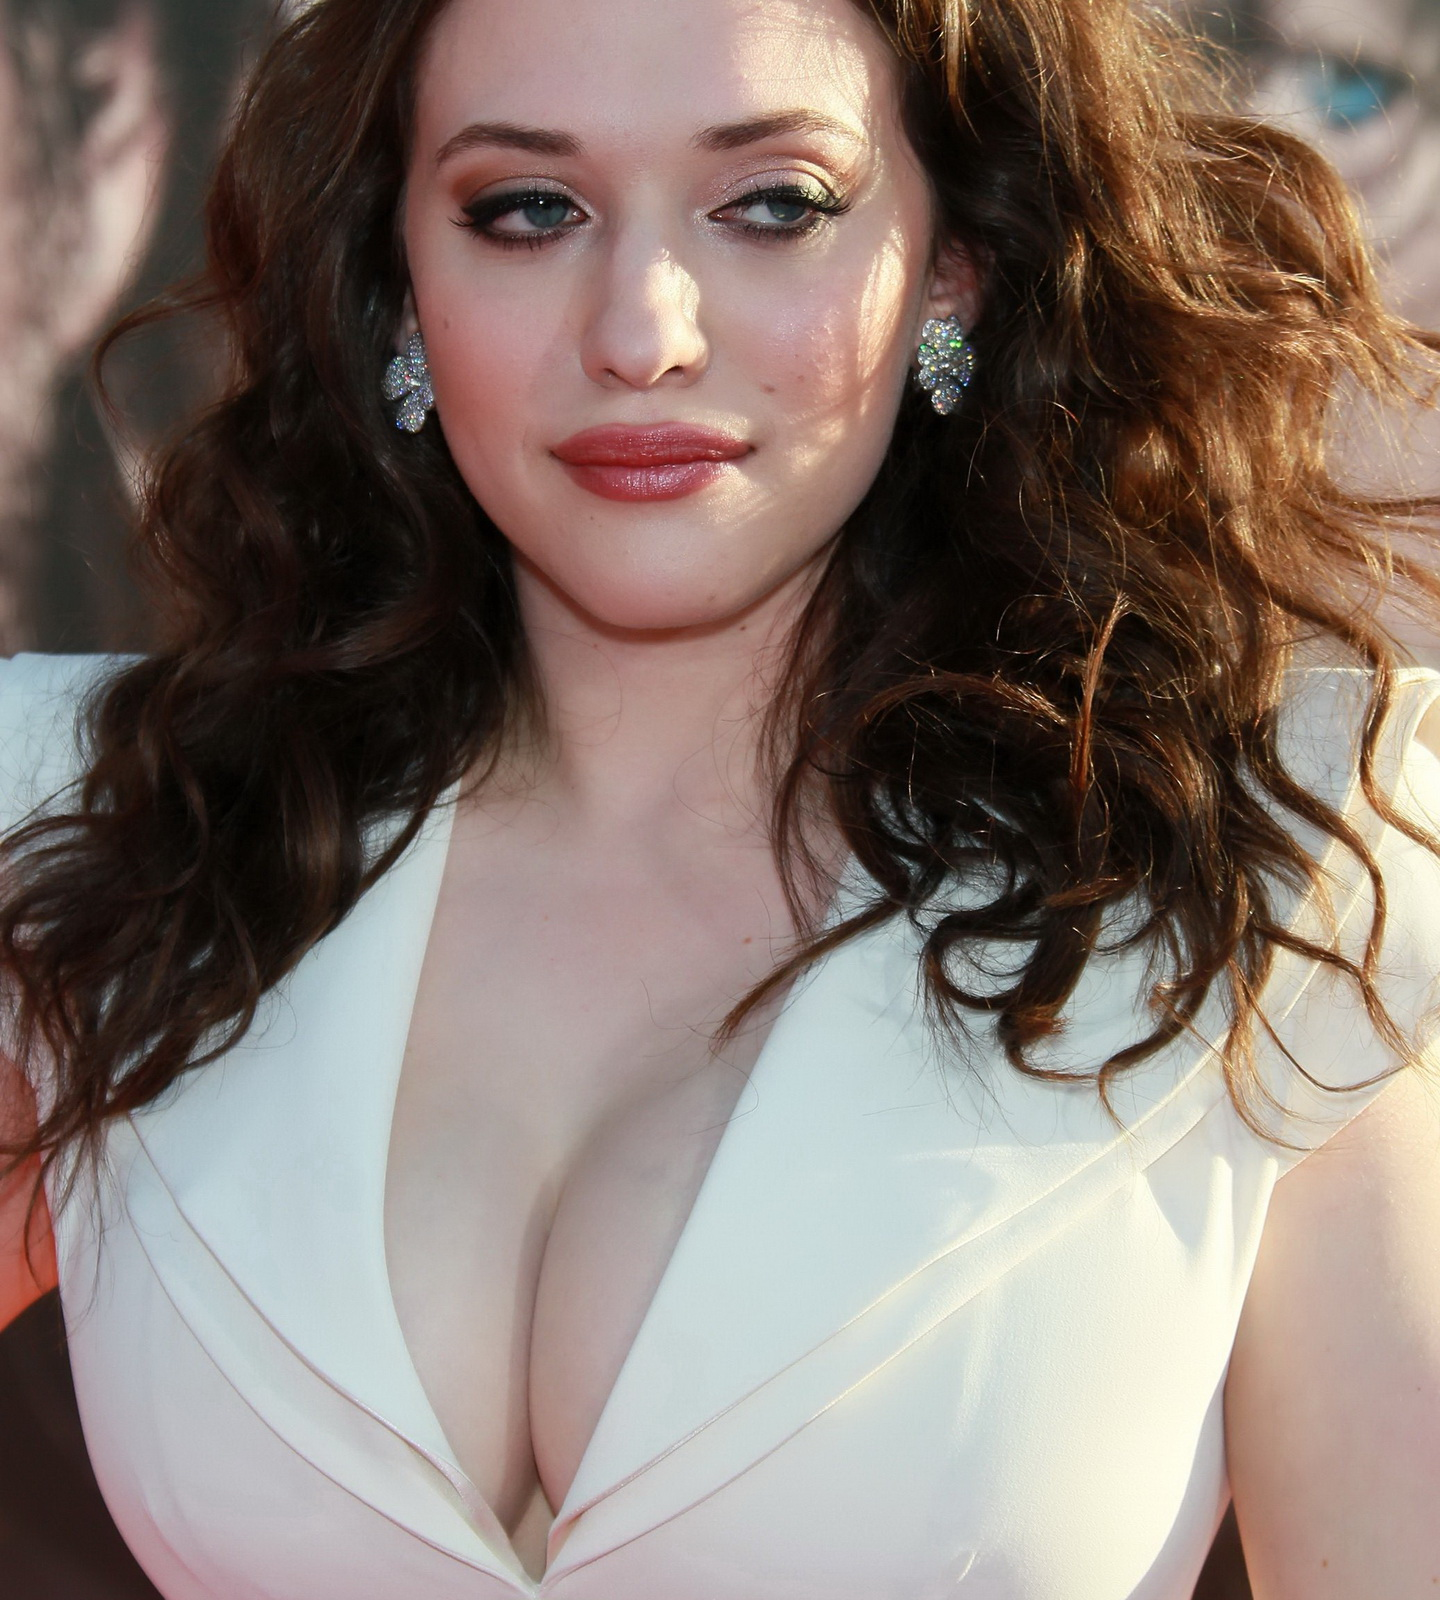 Erotica Cleavage Elena Alexandra Apostoleanu  nudes (34 fotos), 2019, cleavage